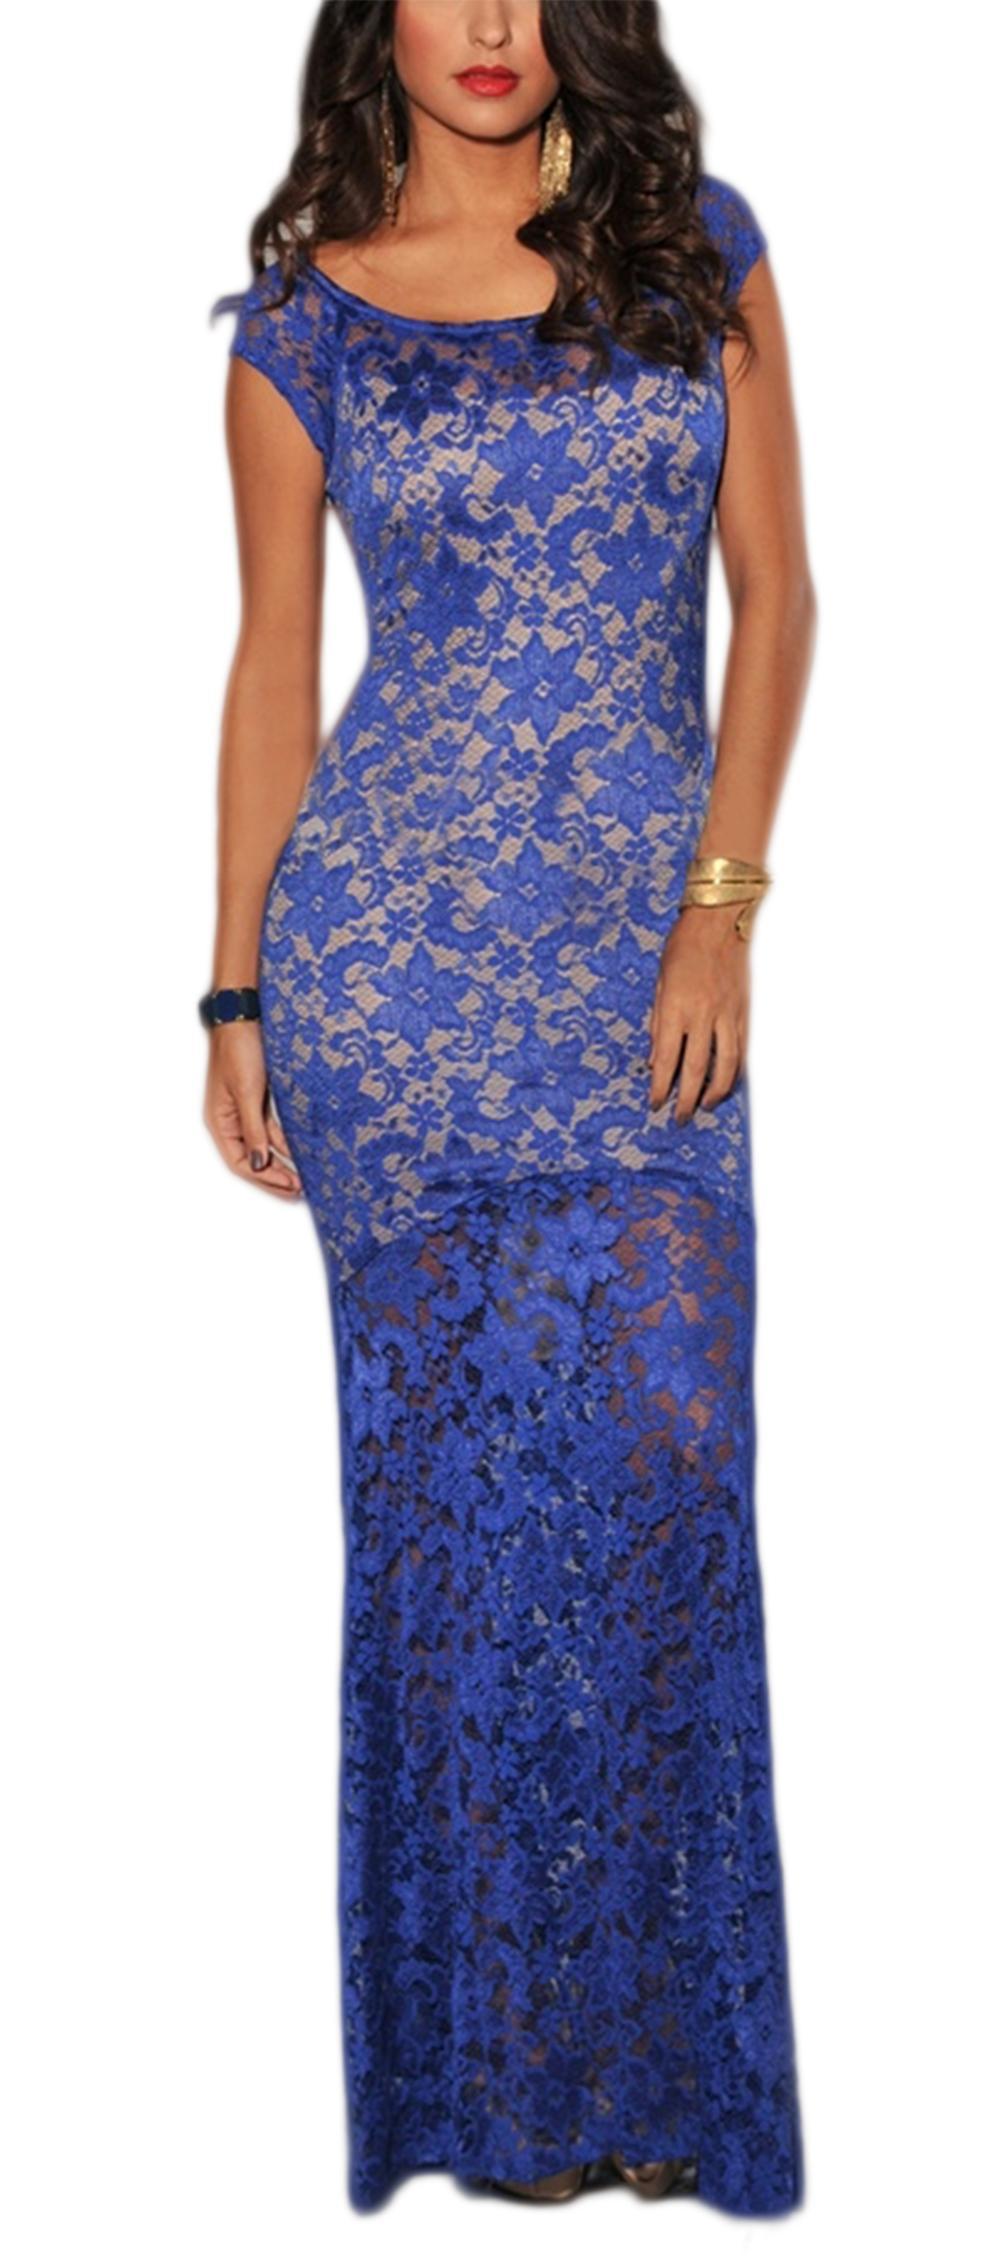 Waooh - Cardet lace dress